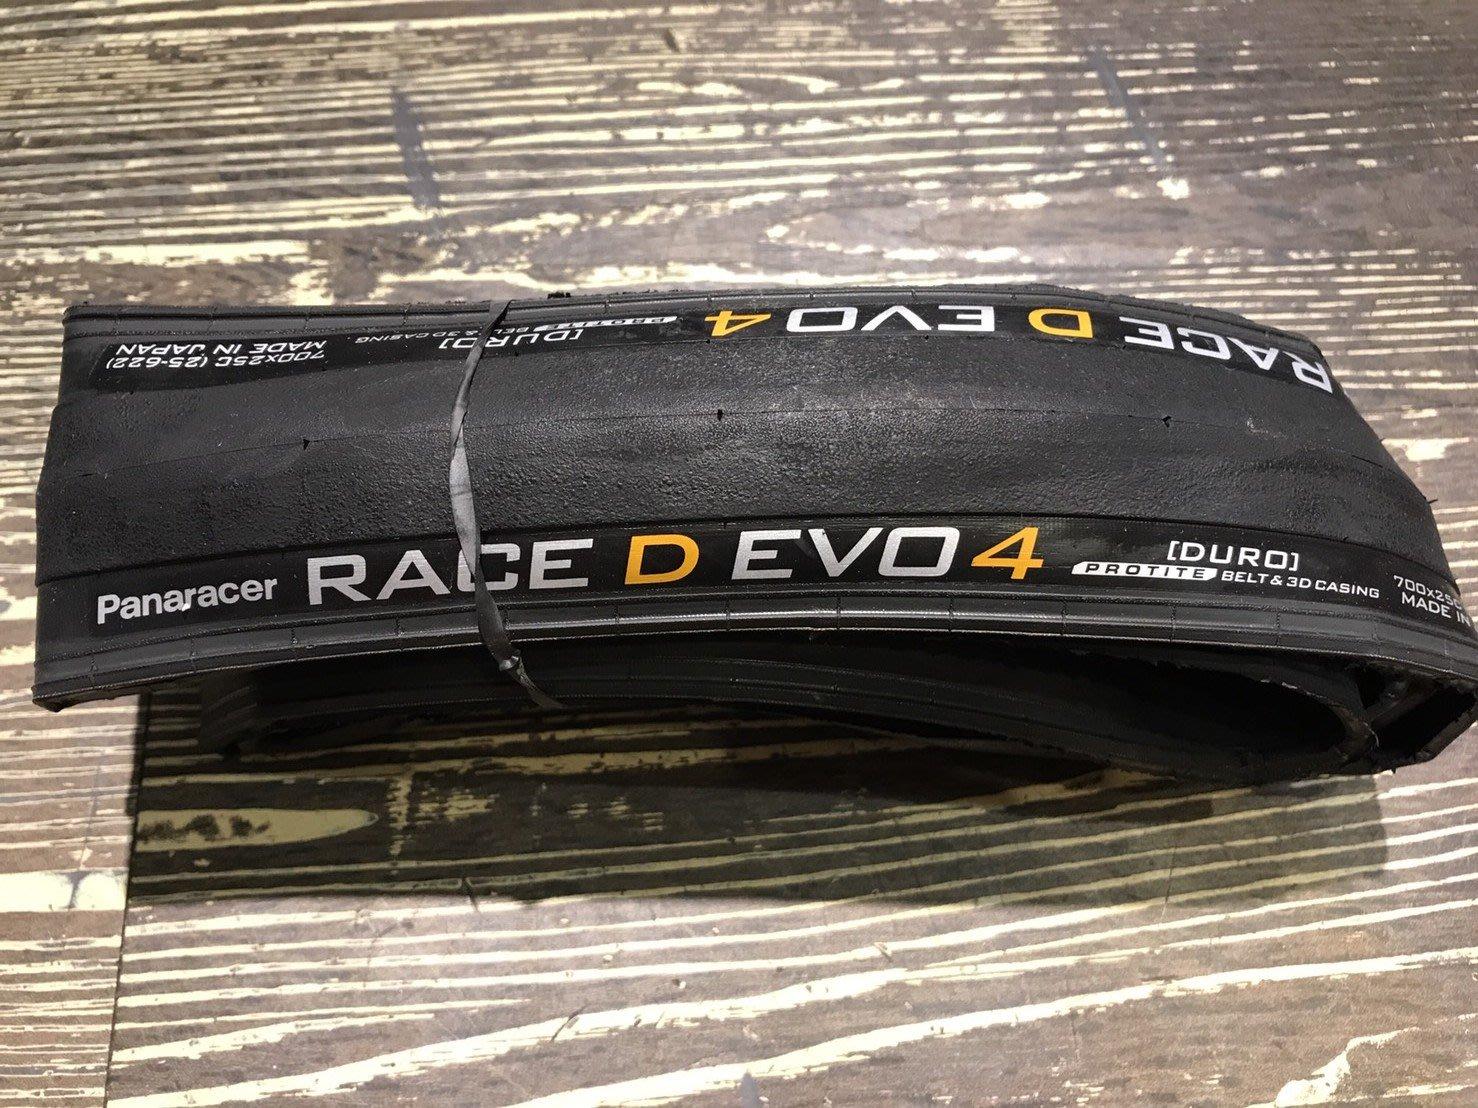 [304bike 台北市]Panaracer race D EVO 4 公路外胎 700x25C GP4000II參考